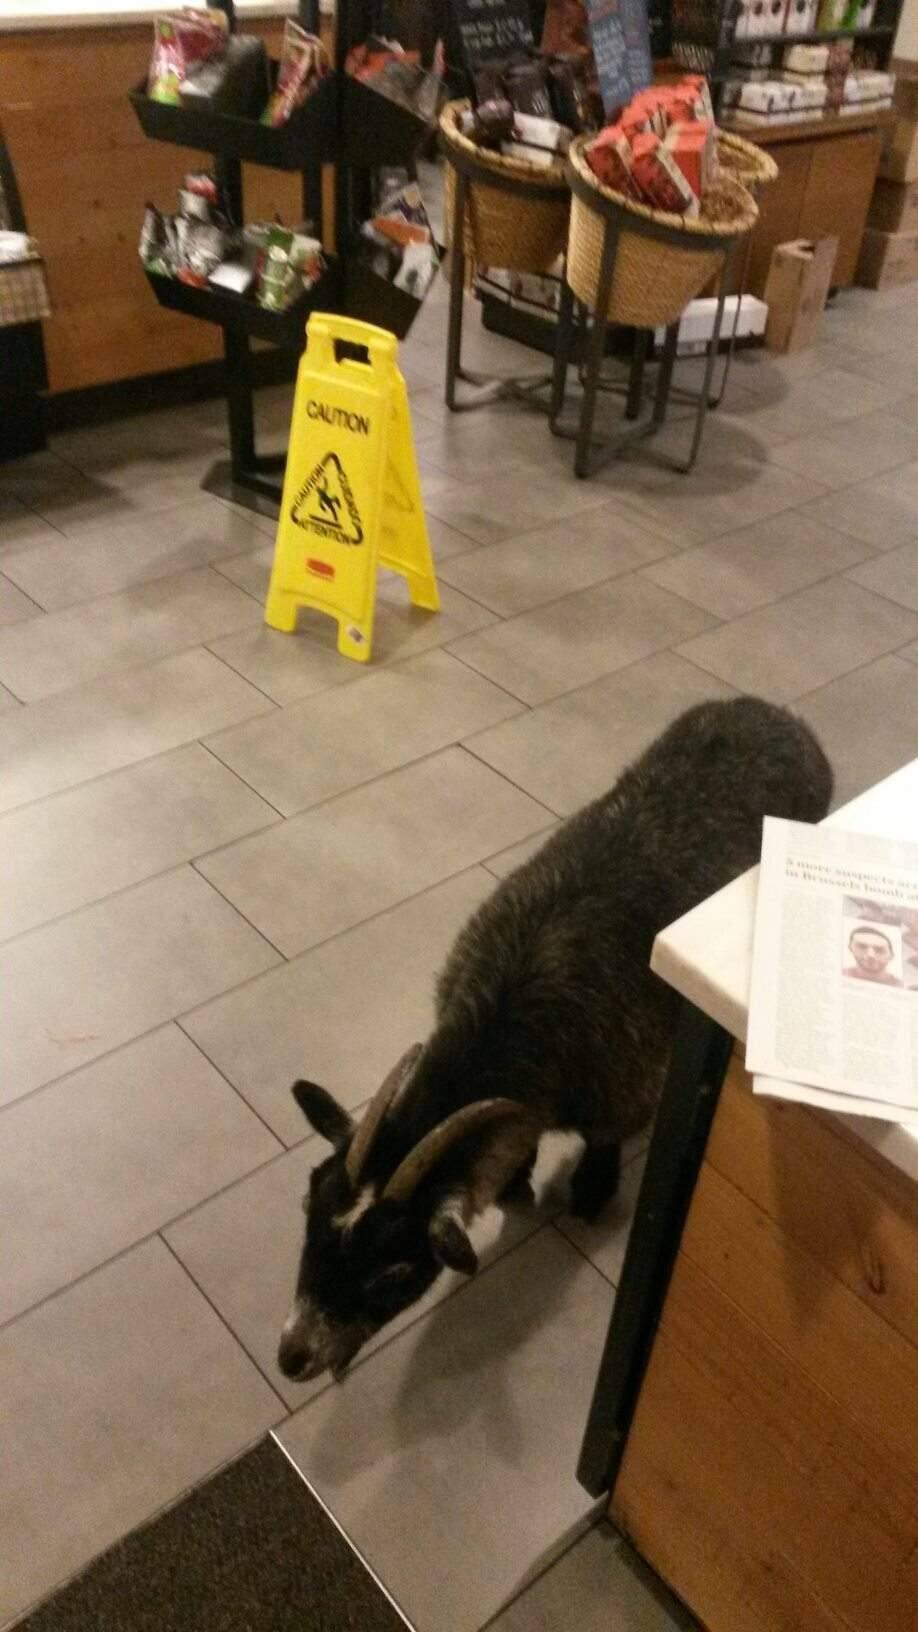 Milly the goat at Rohnert Park Starbucks. (Sgt. Rick Bates, Rohnert Park police)